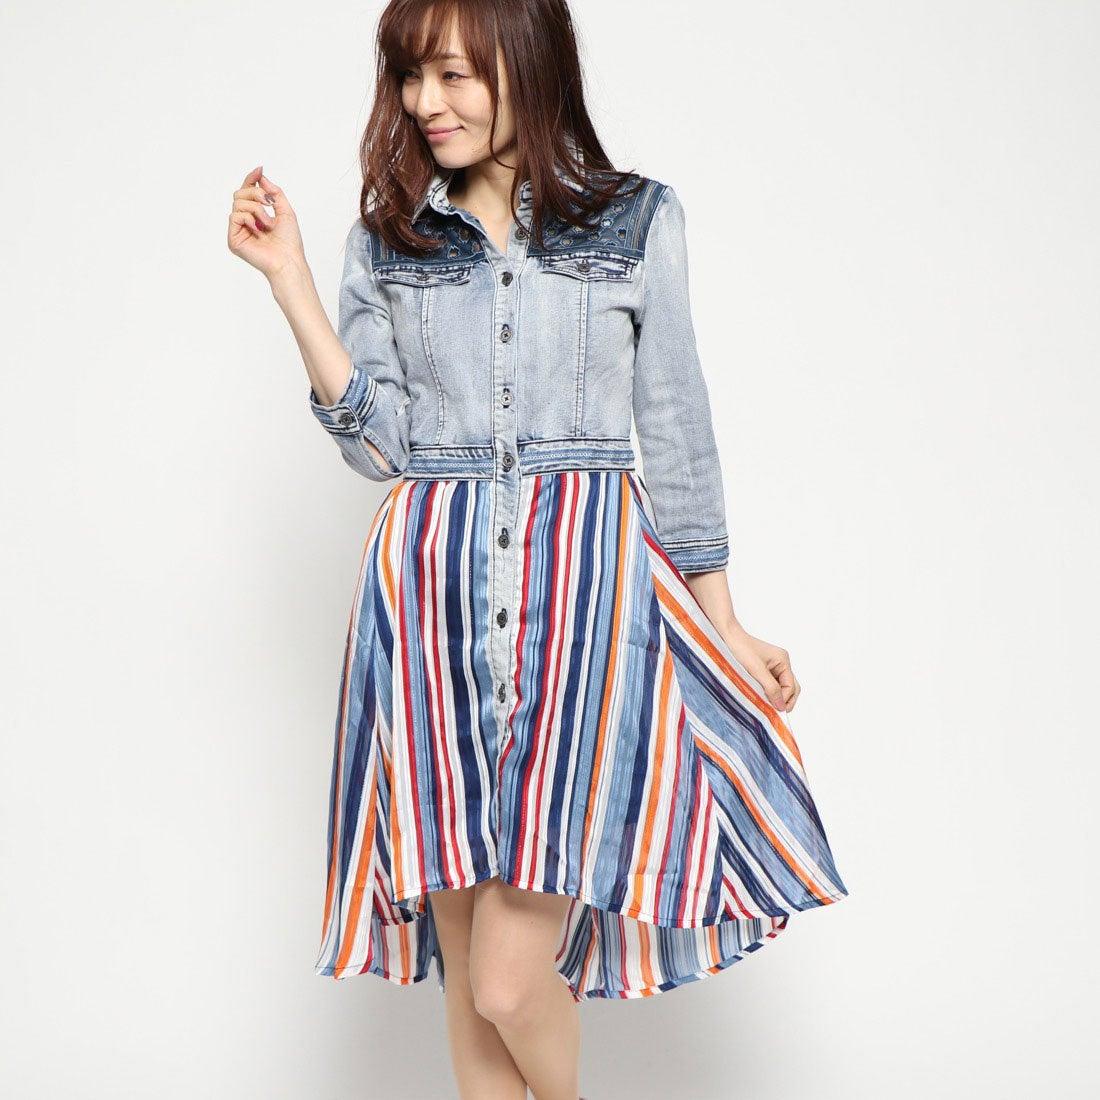 093a4c1841099 デシグアル Desigual ドレス袖なし (ブルー) -靴&ファッション通販 ロコンド〜自宅で試着、気軽に返品